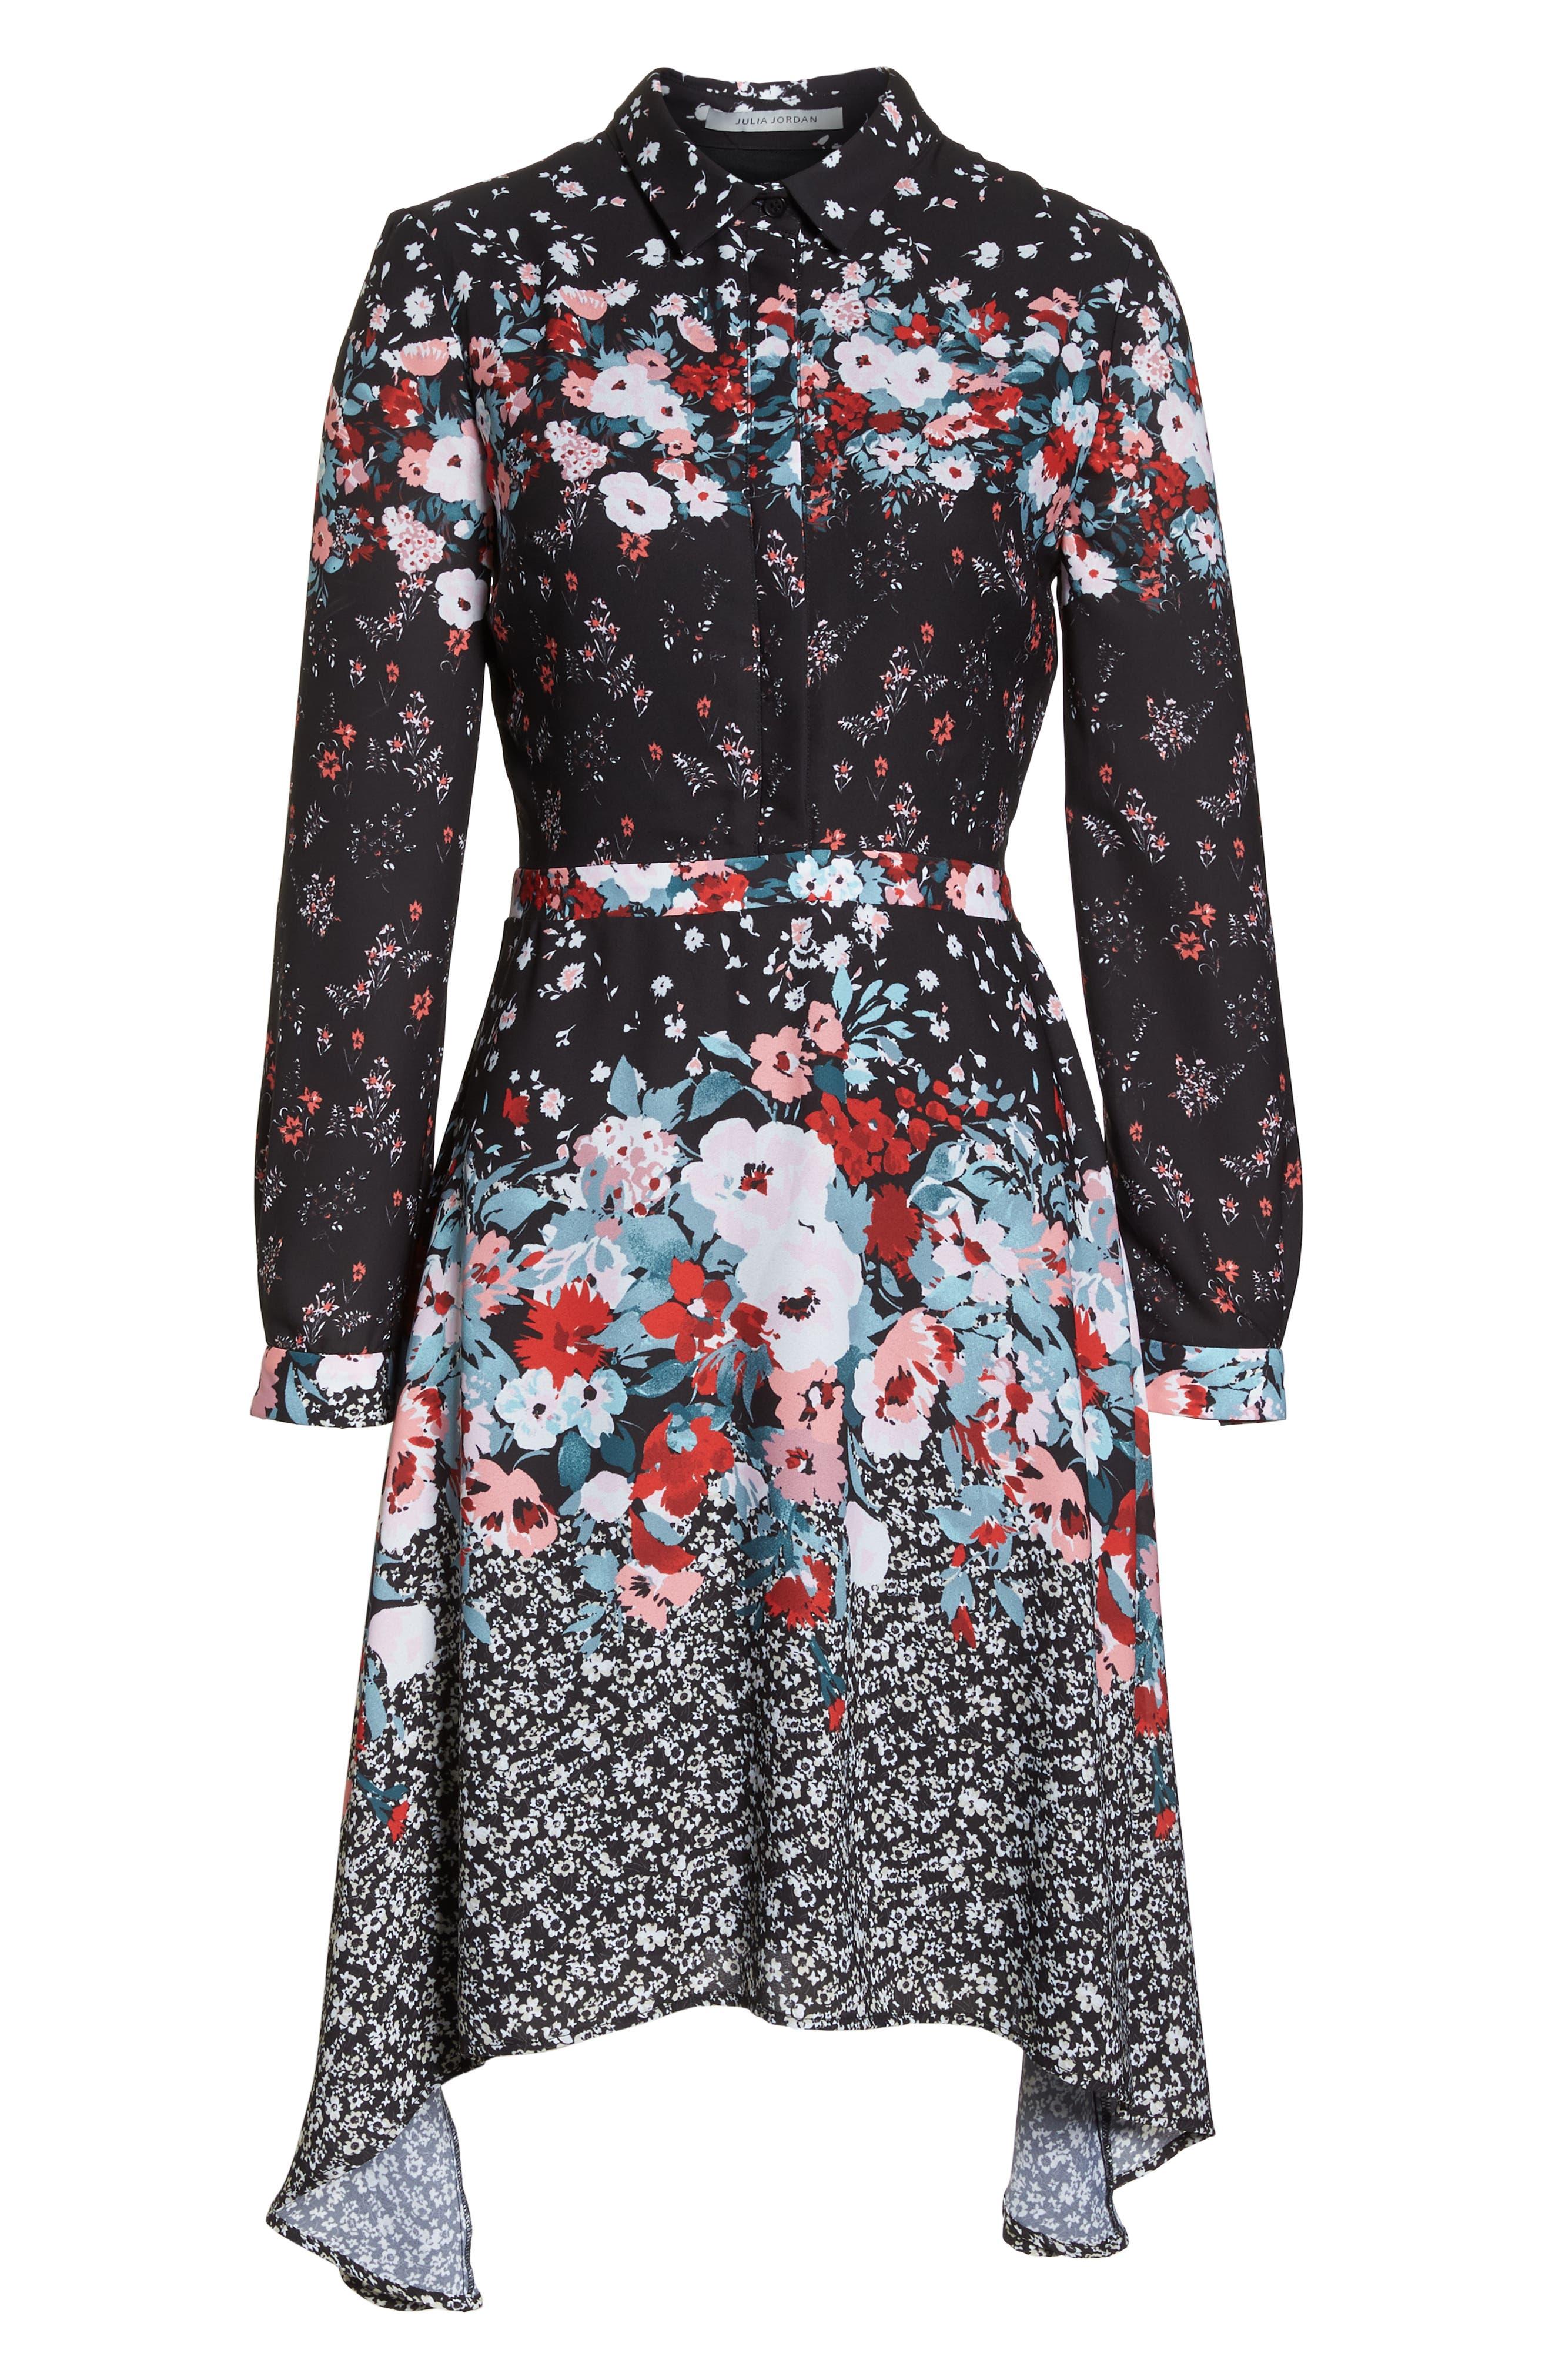 JULIA JORDAN, Floral Print Shirtdress, Alternate thumbnail 7, color, 017